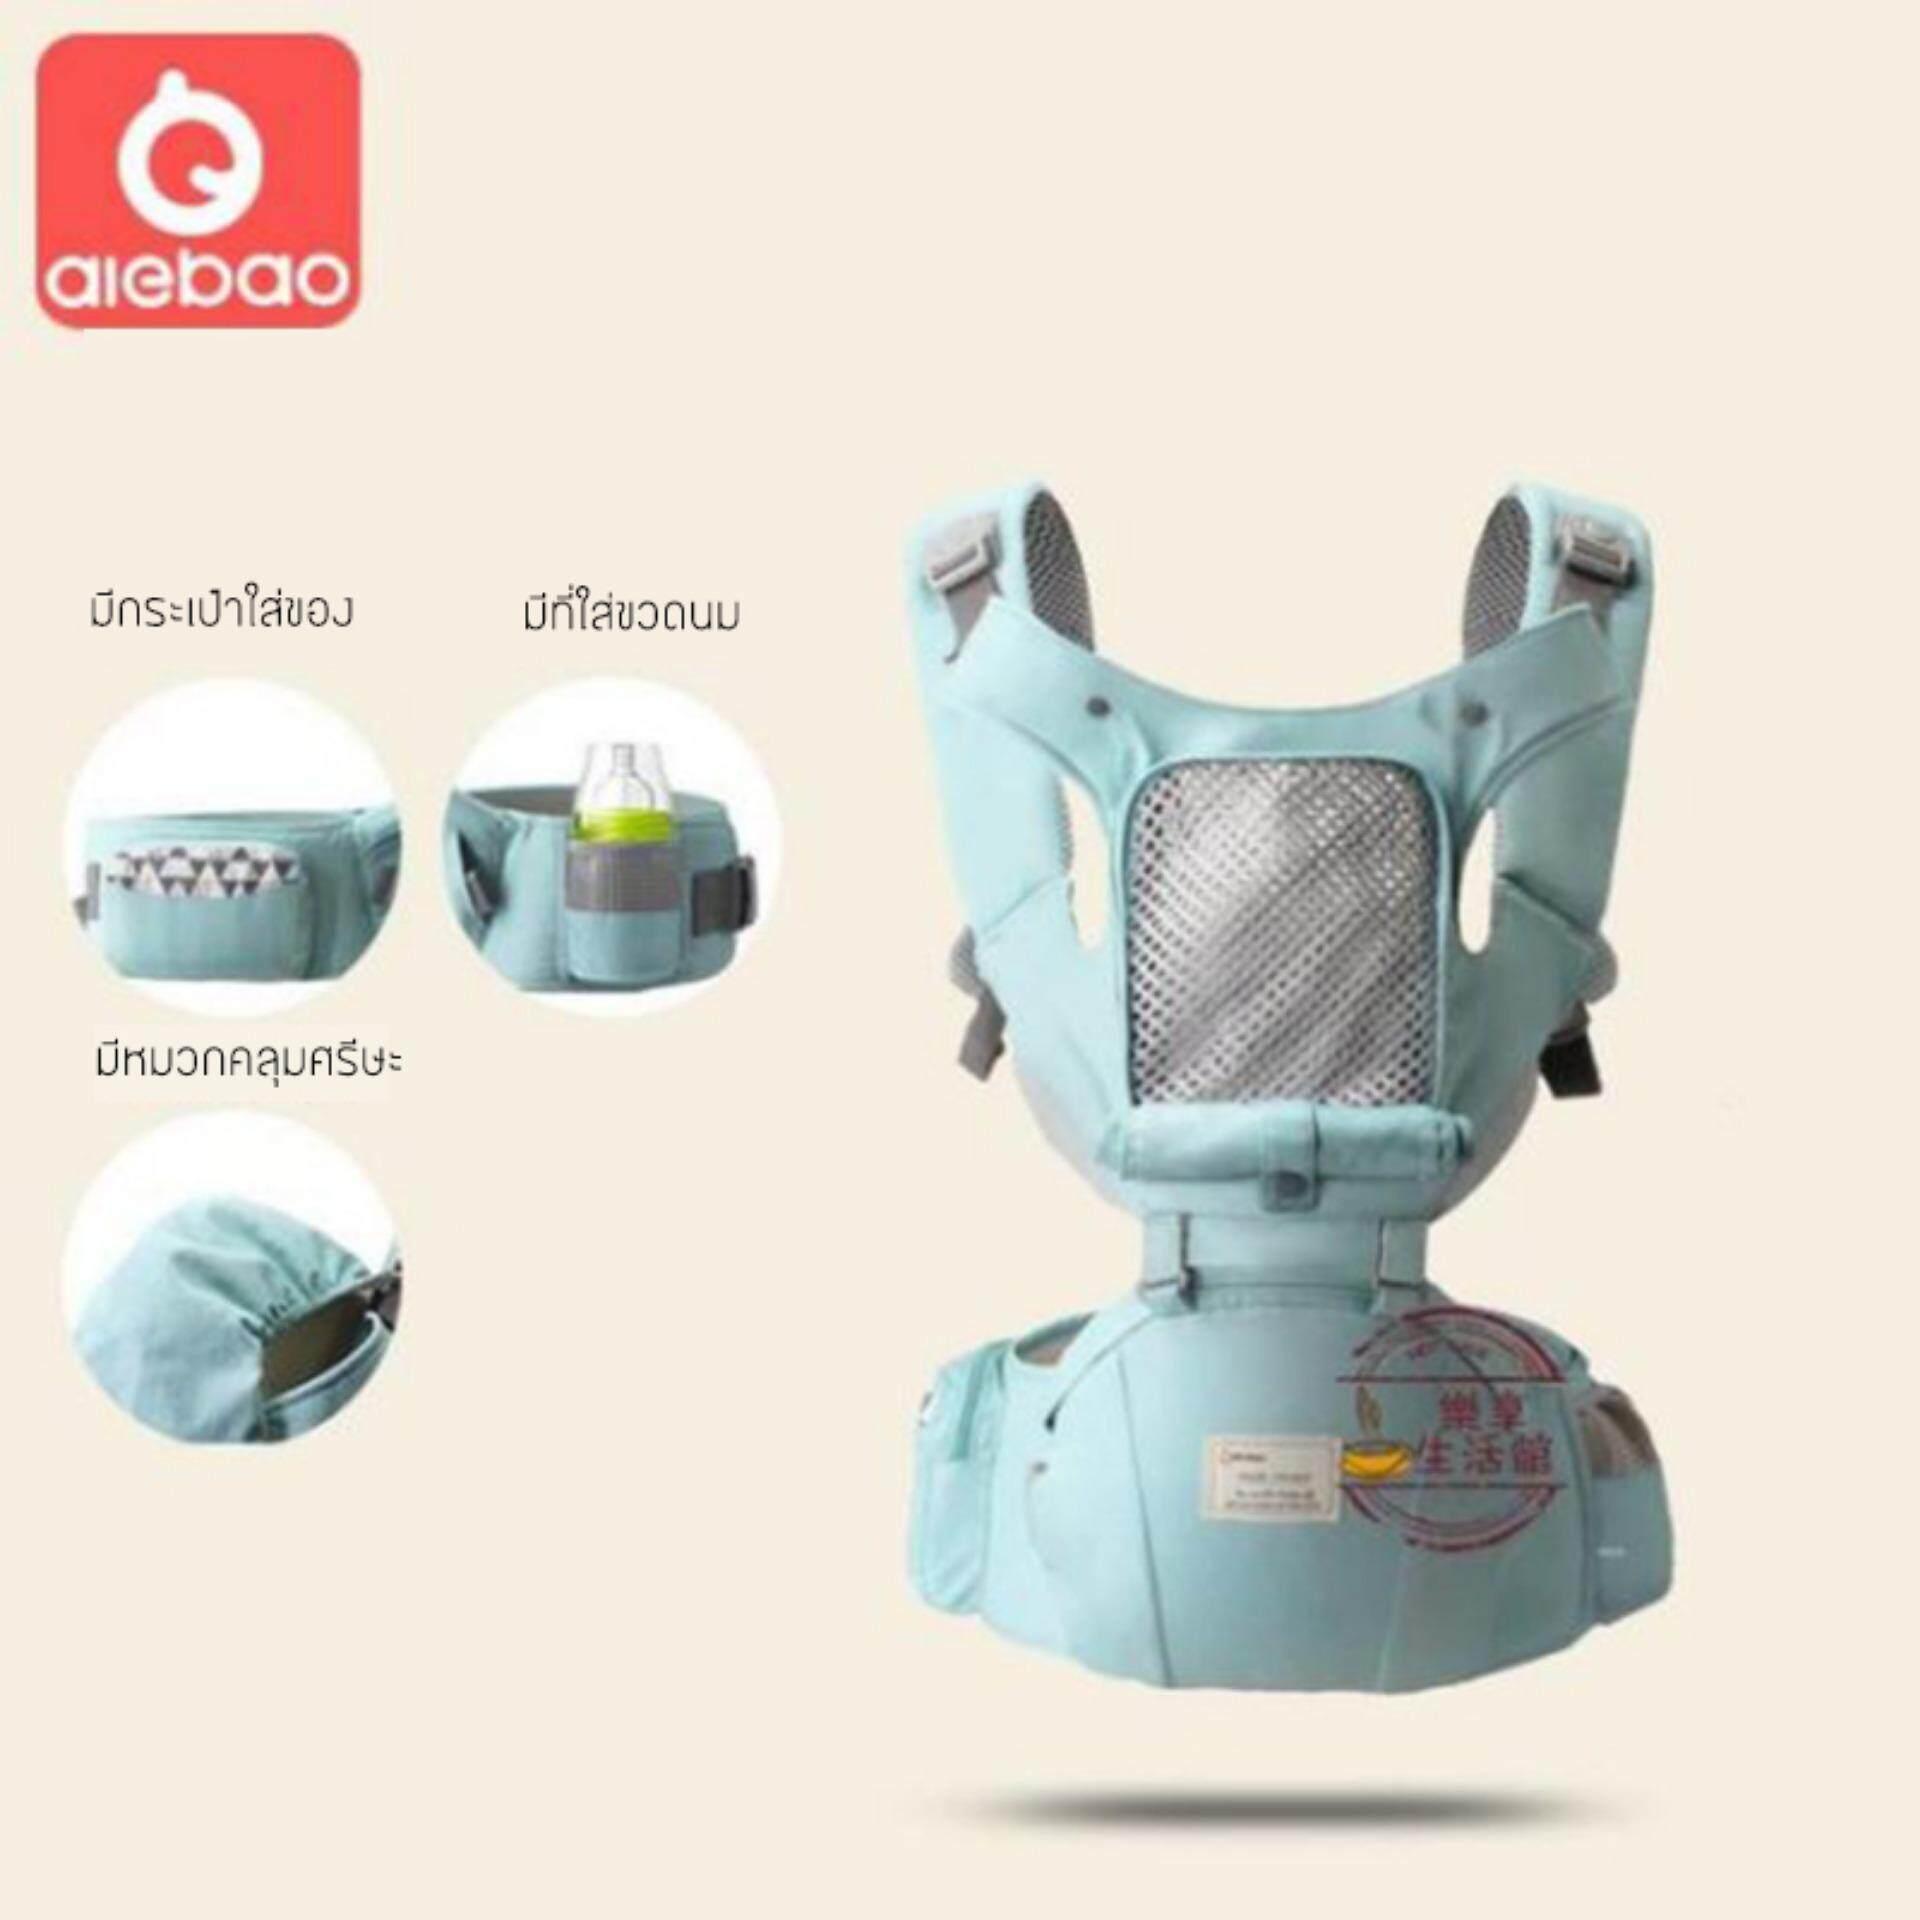 Baby Boo เป้อุ้มเด็ก รุ่นล่าสุด (aiebao) Hip Seat 3 In 1 สามารถนั่งและนอนได้ พาสเทล(Pastel) สะพายหน้าและสะพายหลังได้ รุ่น:B21 พิเศษ